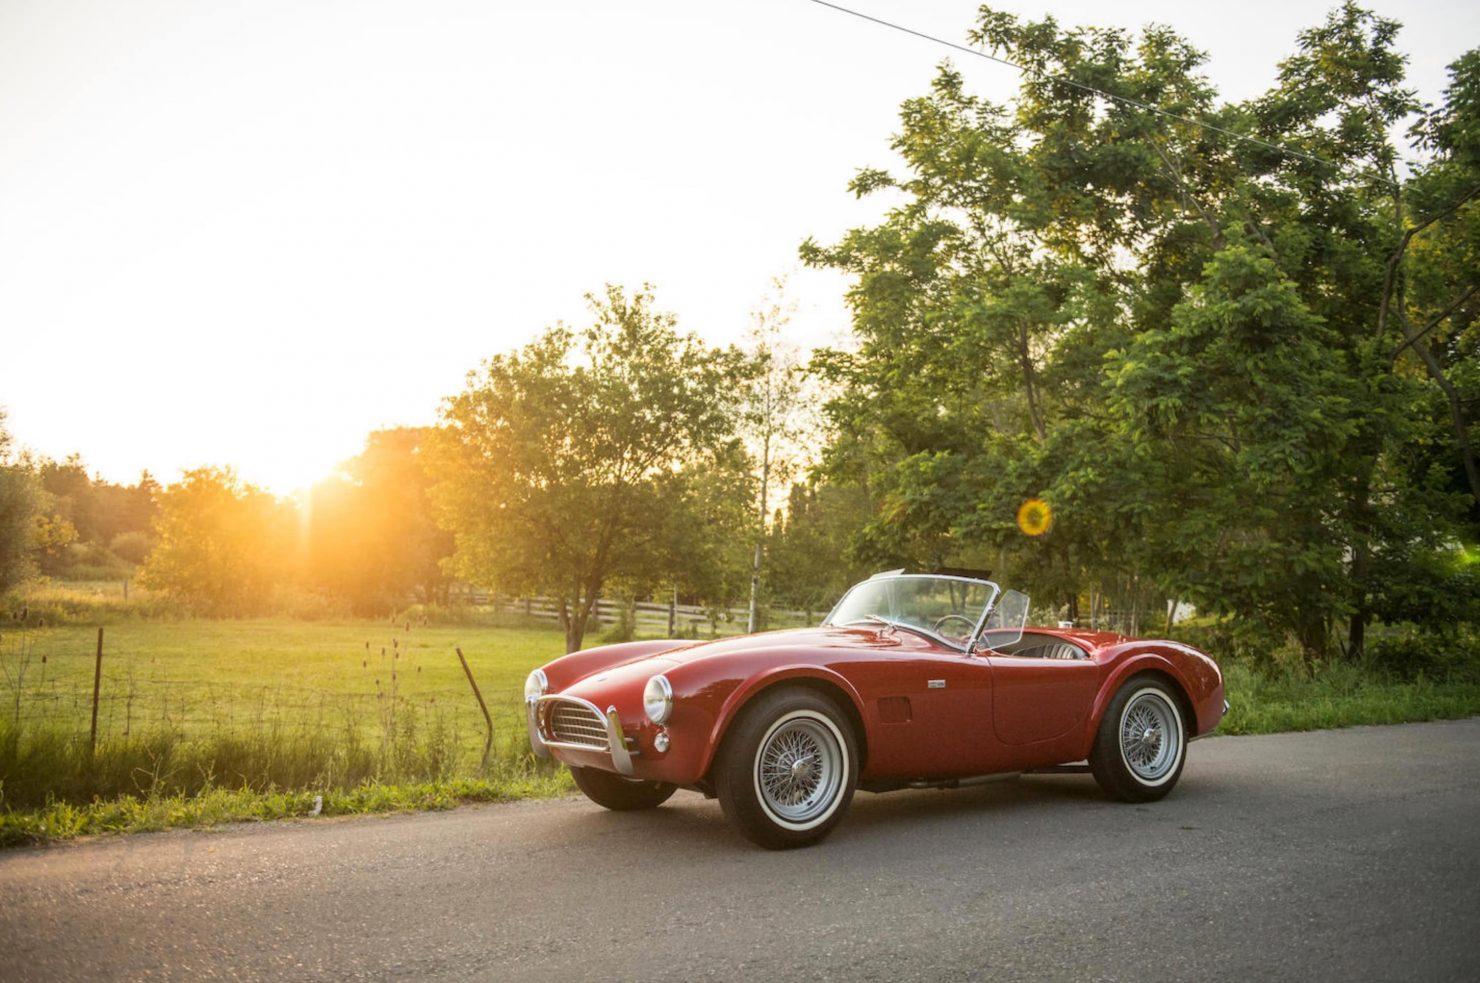 shelby ac cobra 289 15 1480x983 - 1964 Shelby AC Cobra 289